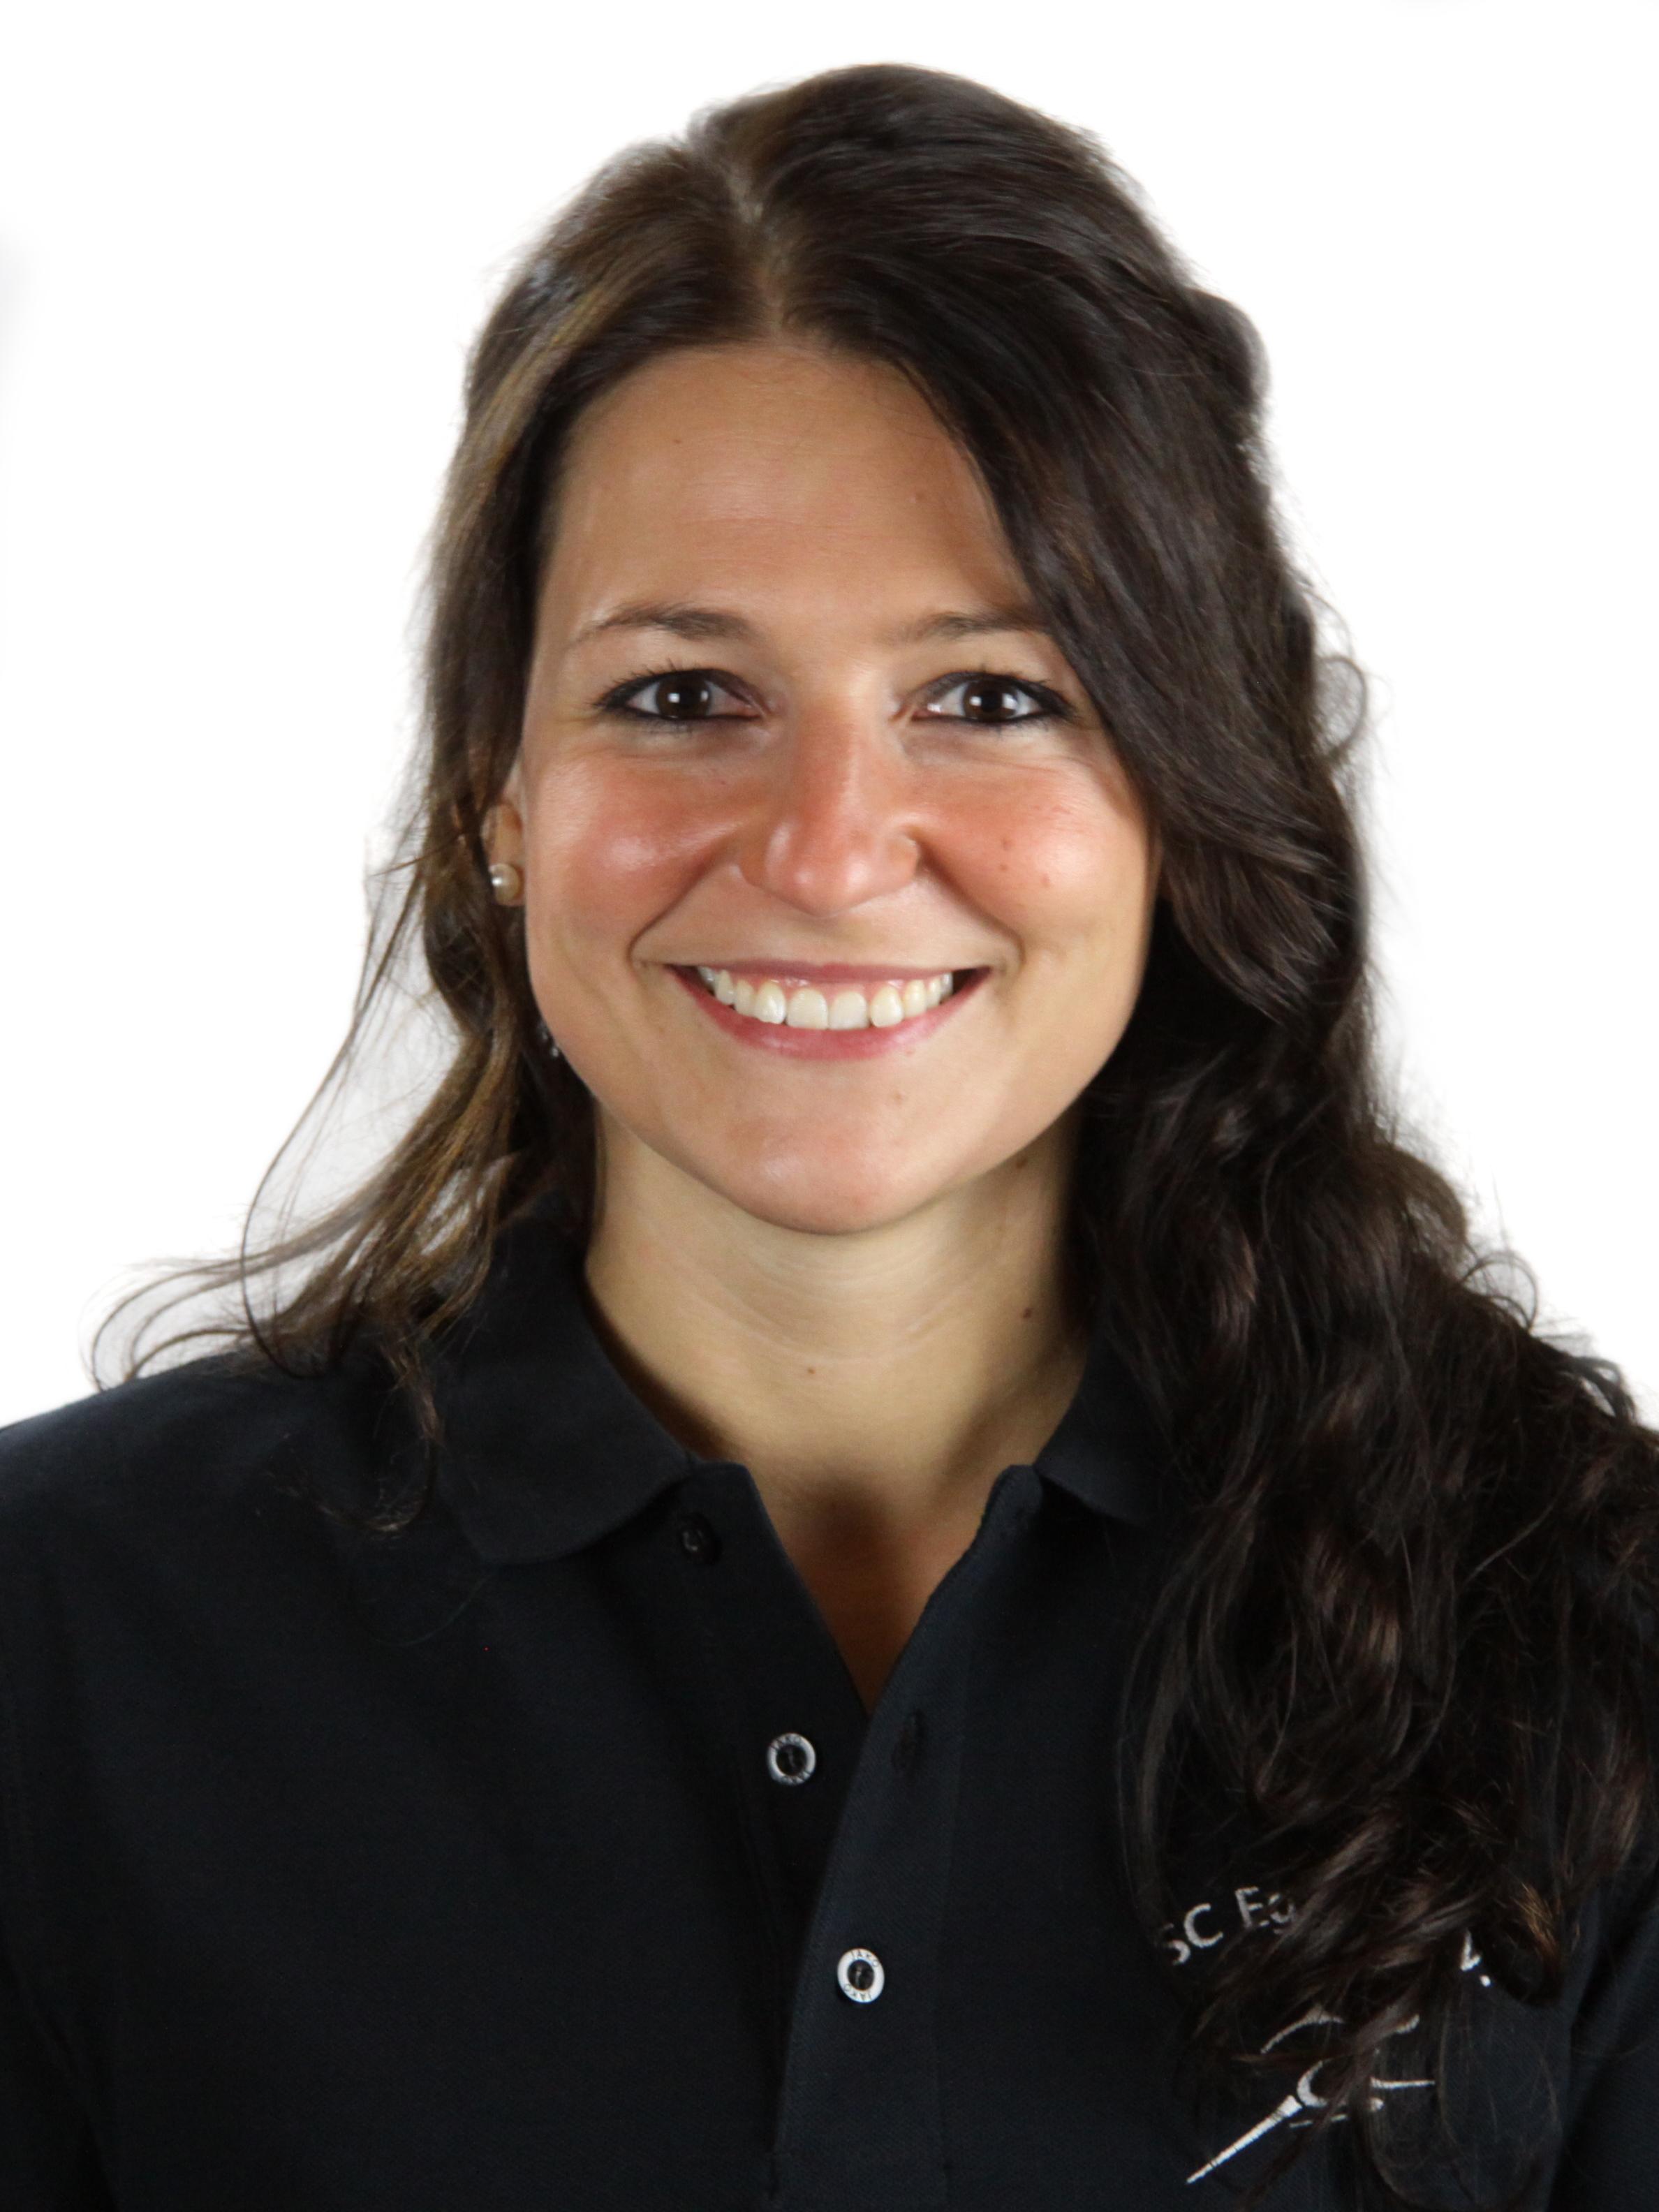 Karin Högenauer